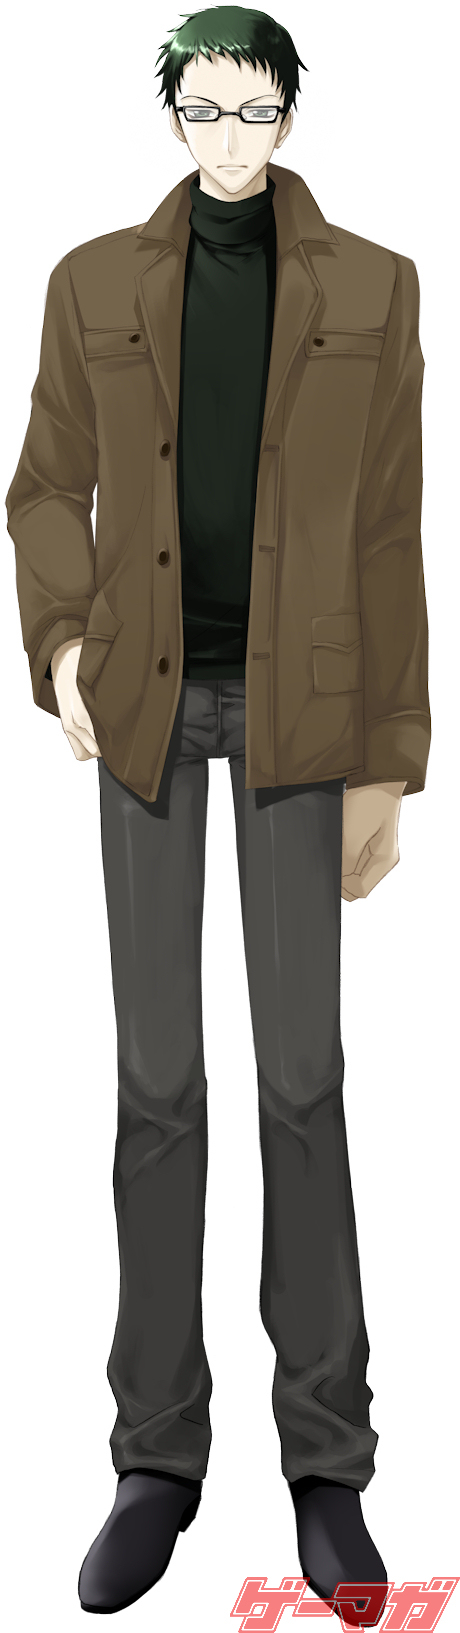 Tags: Anime, Memories Off Series, Your Memories Off Girl's Style, Ichii Kiyotaka, Official Art